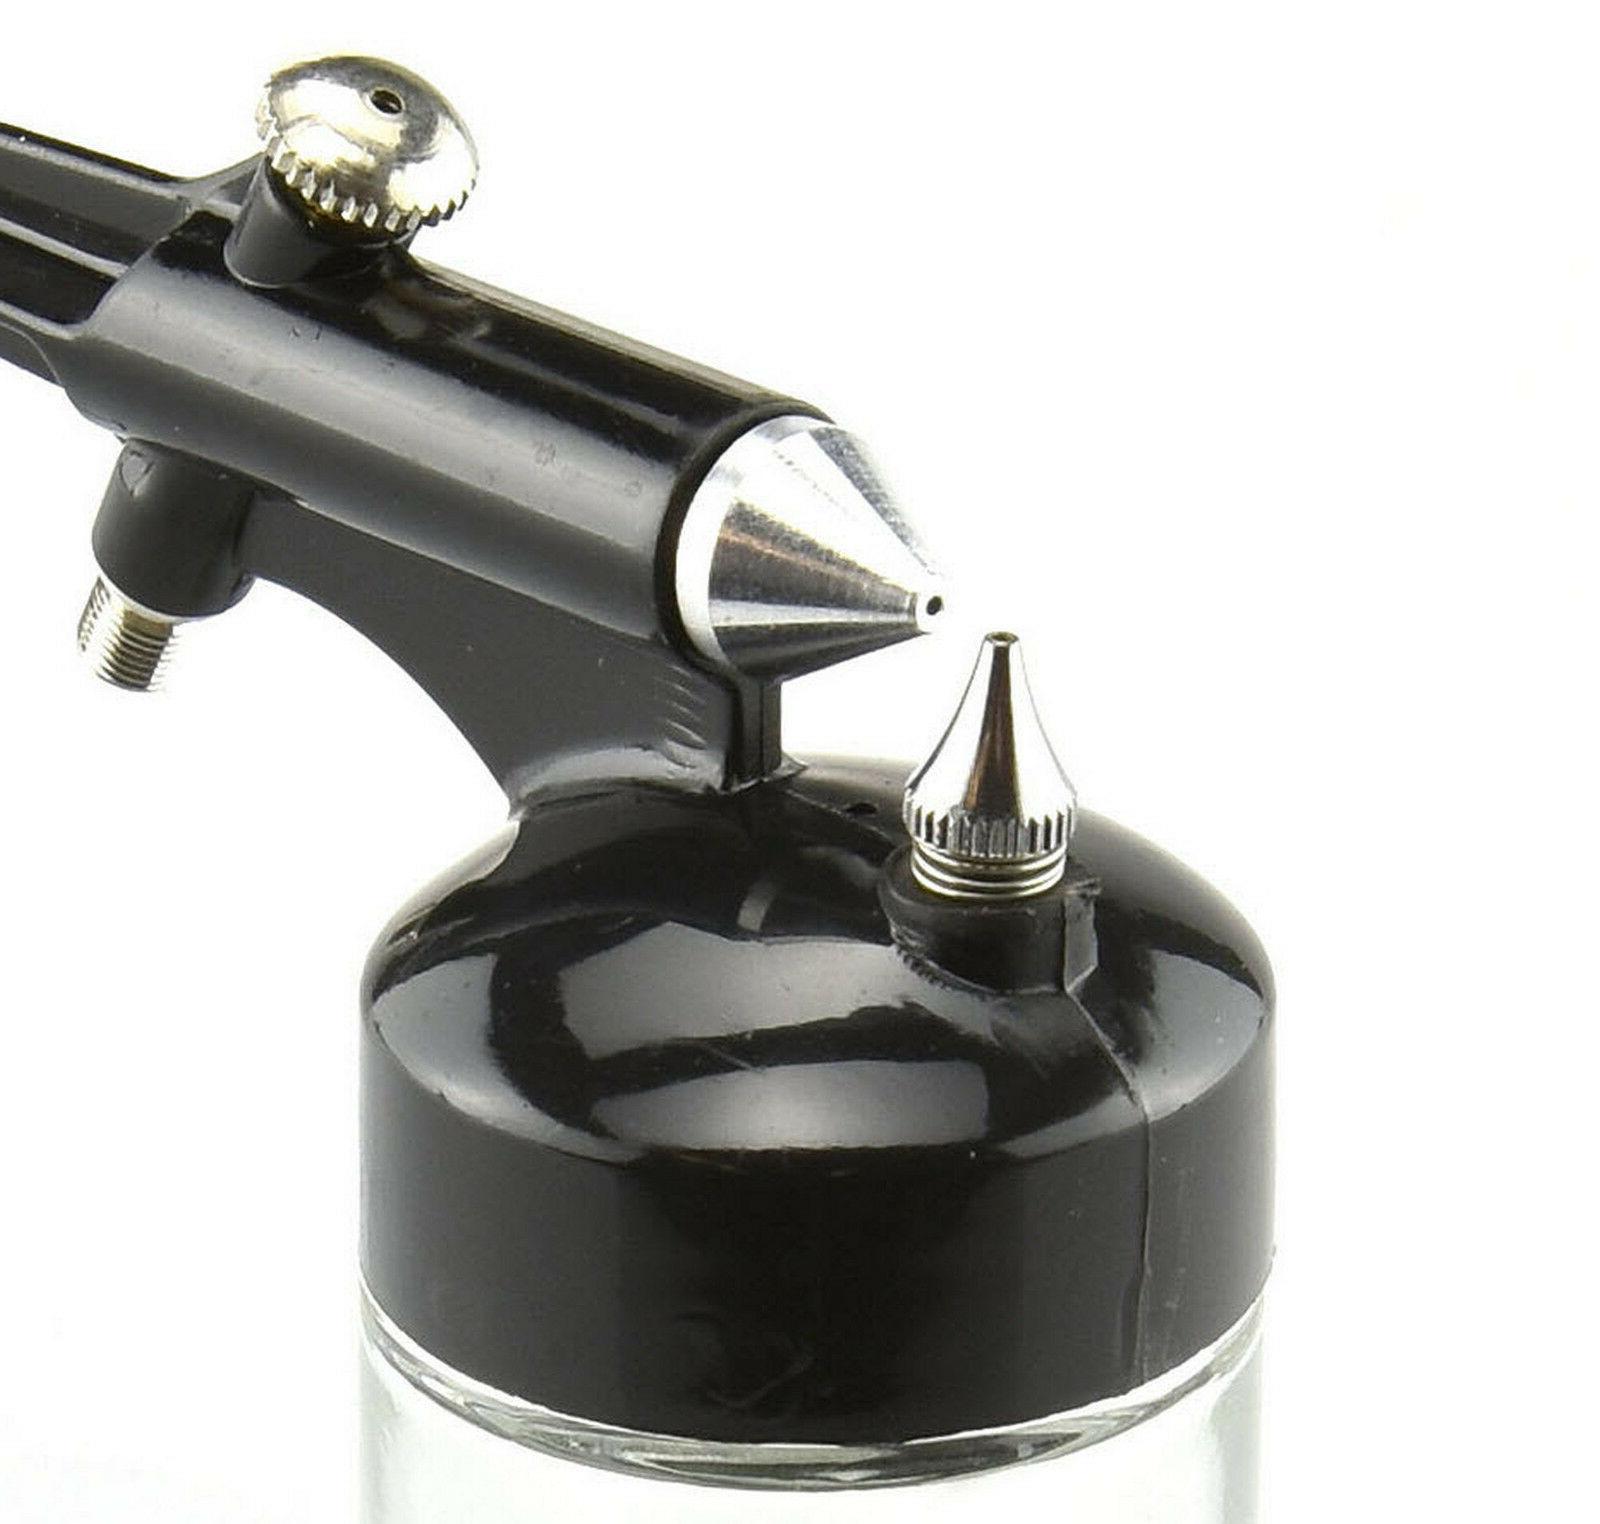 NEIKO Brush Hobby Kit Propellent Operates at PSI